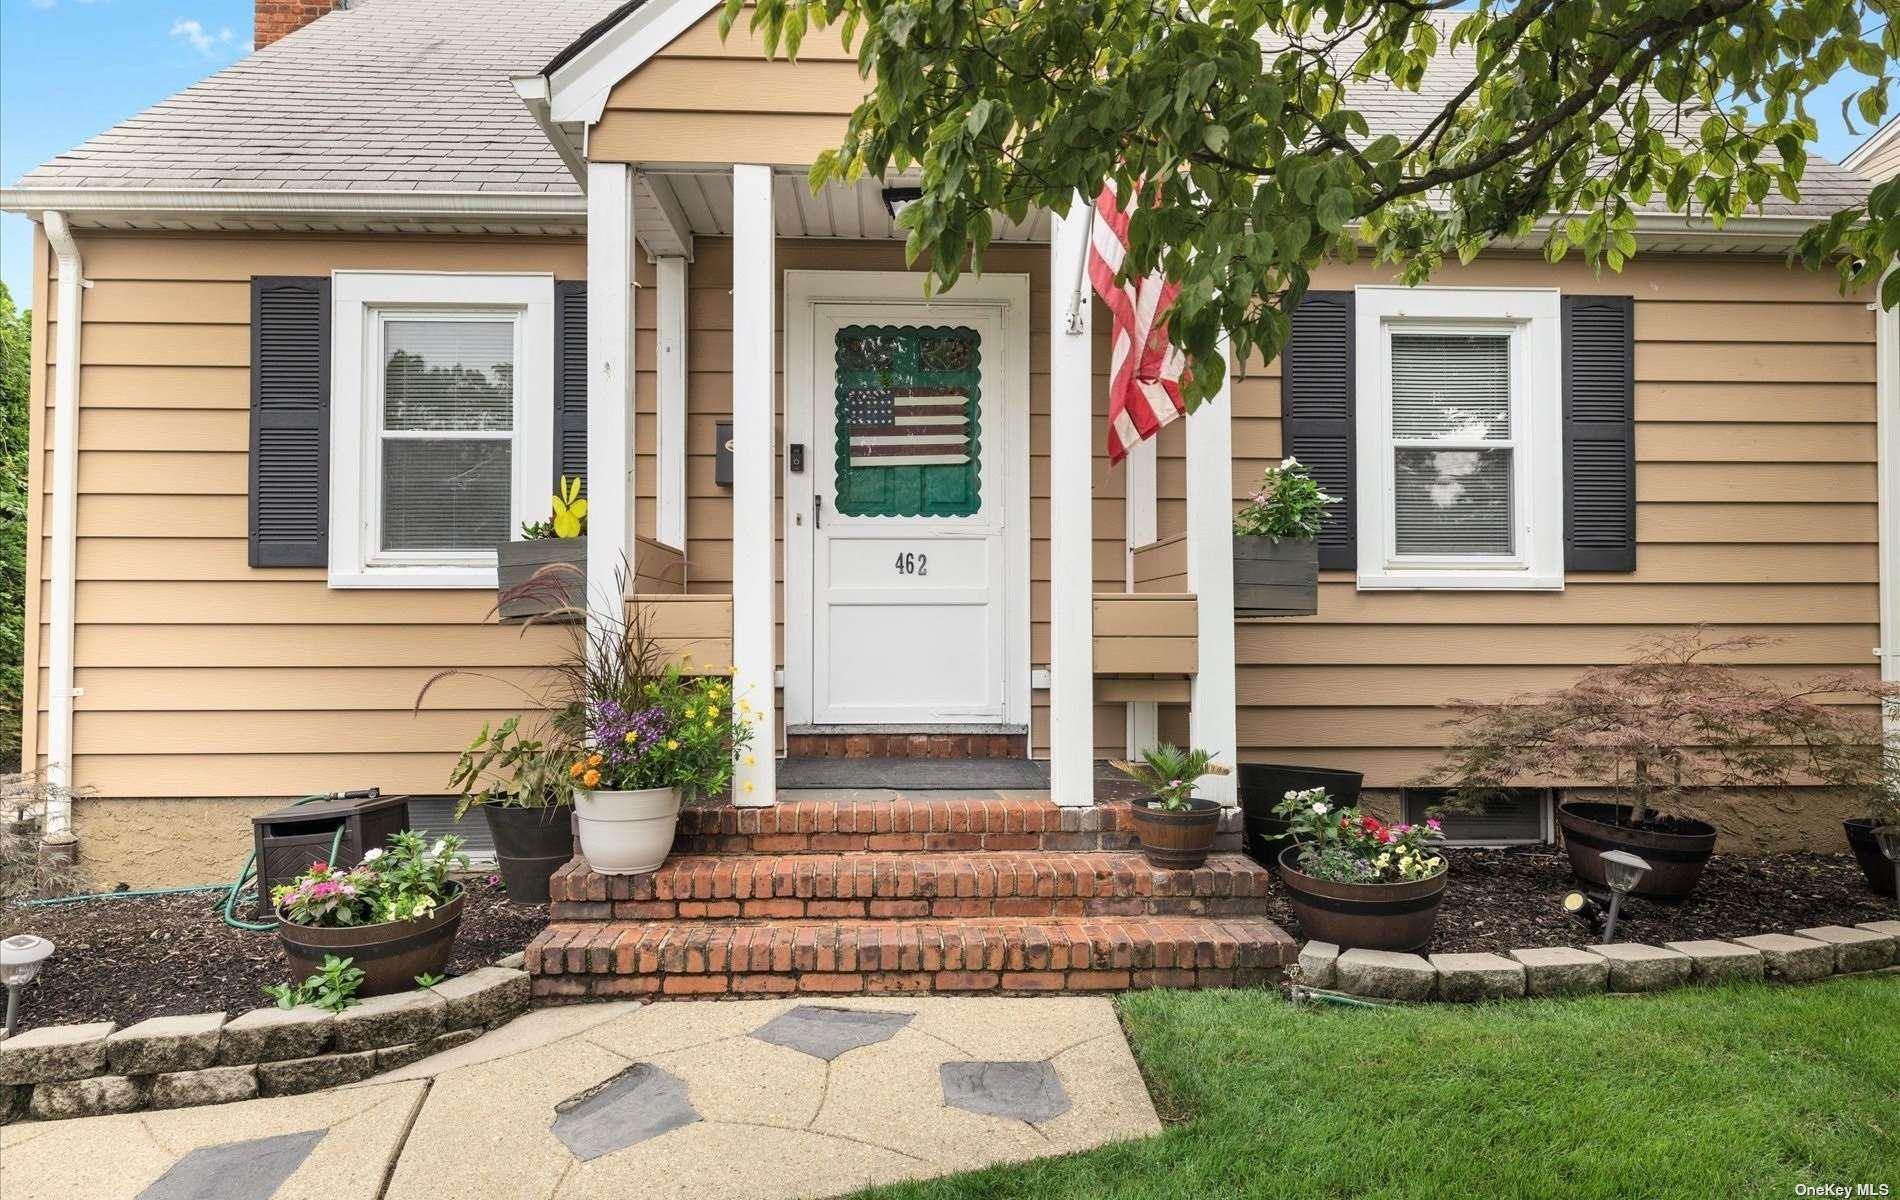 462 Herbert Street, West Hempstead, NY 11552 - MLS#: 3332269